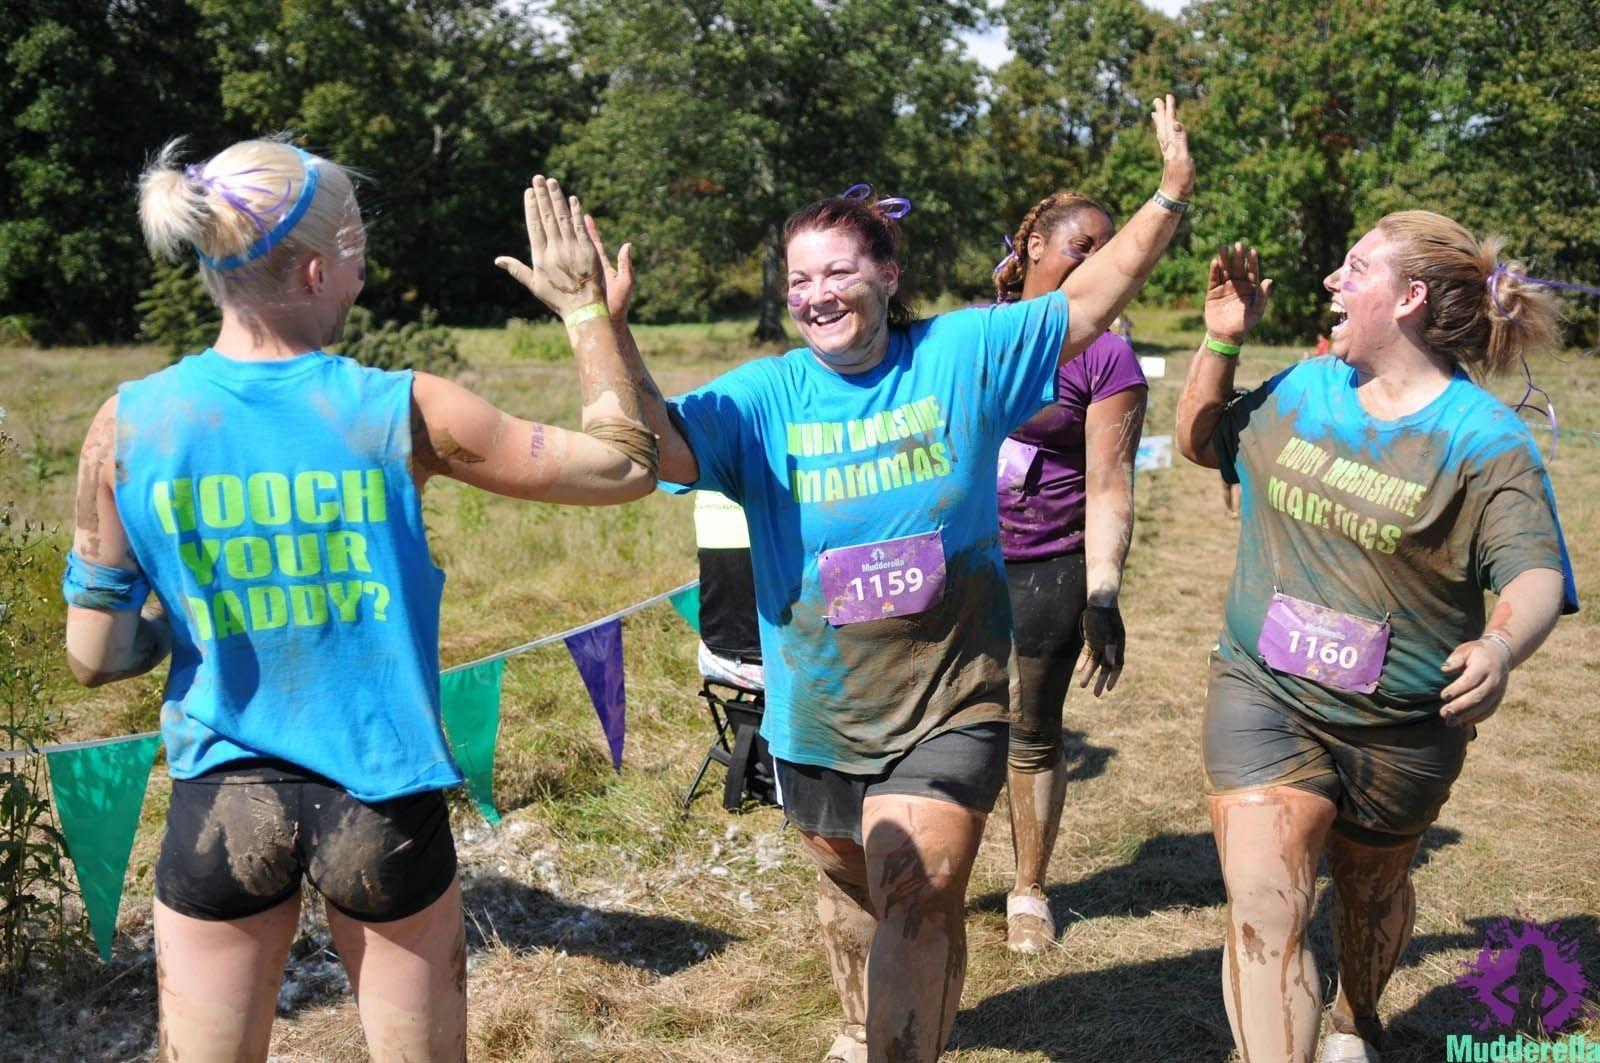 10 Fantastic Mud Run Team Name Ideas 3 tips for your first mudderella your first mud run mudderella 2020